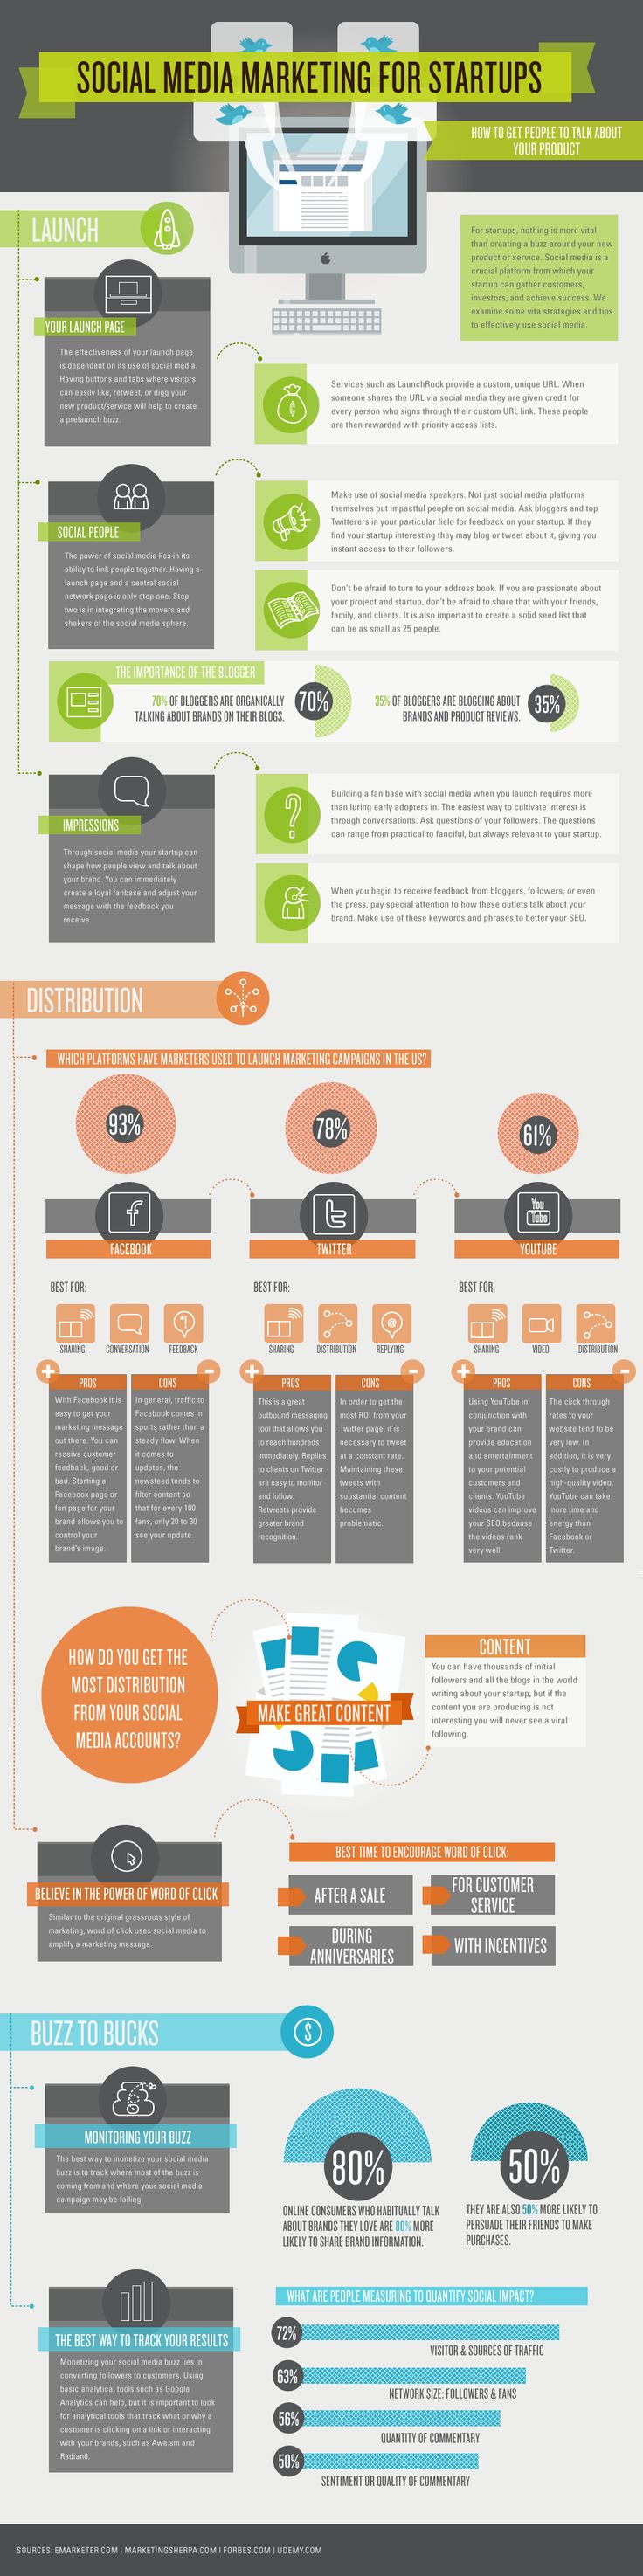 Social Media Marketing For Startups - Infographic